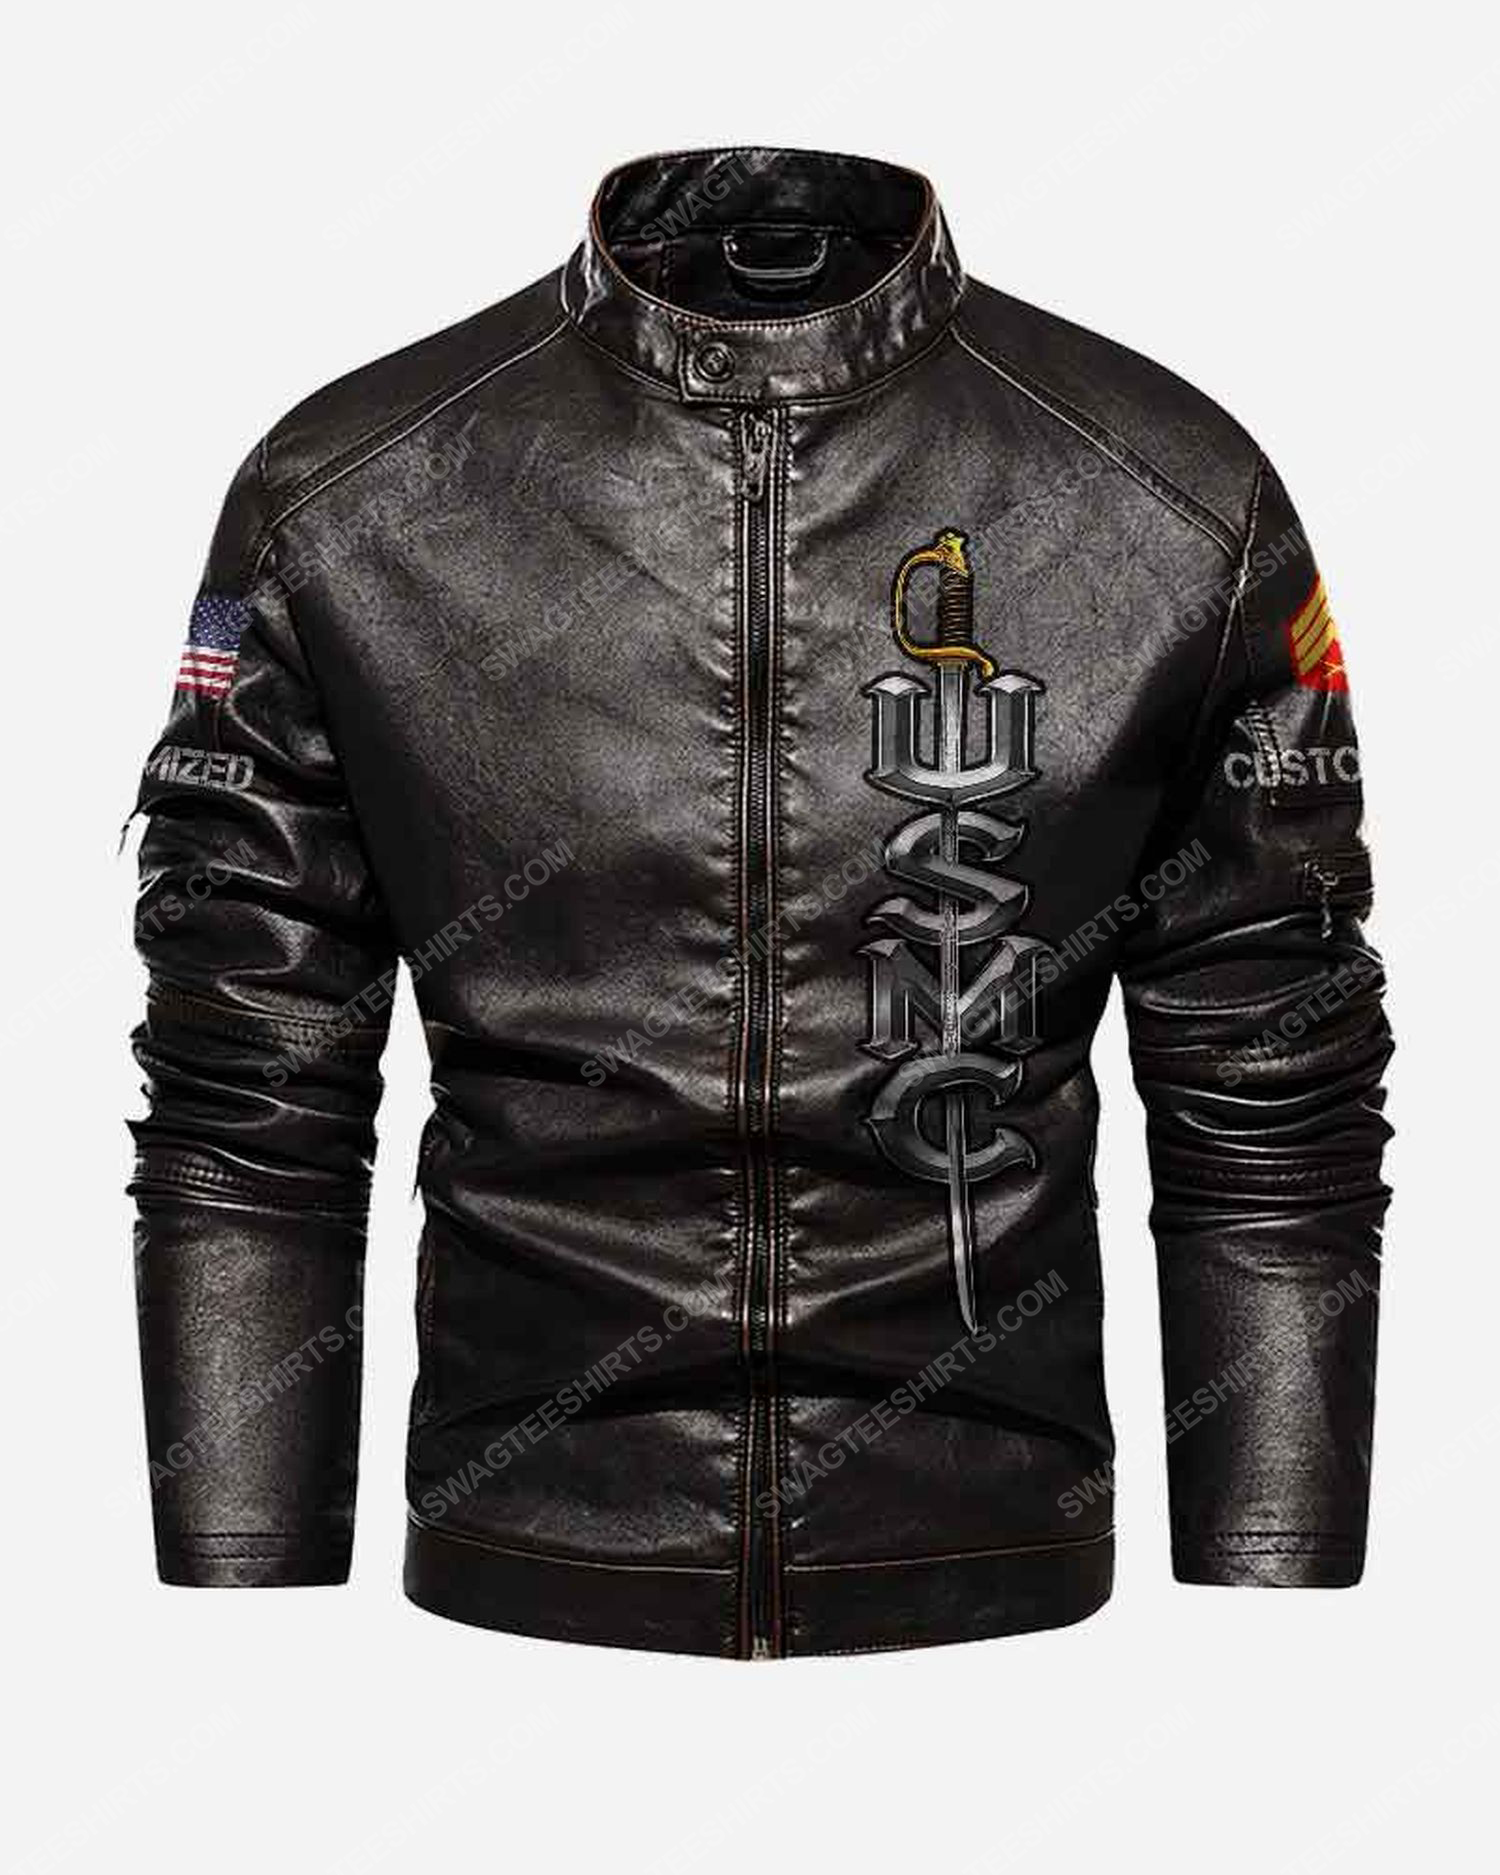 Custom united states marine corps semper fidelis moto leather jacket